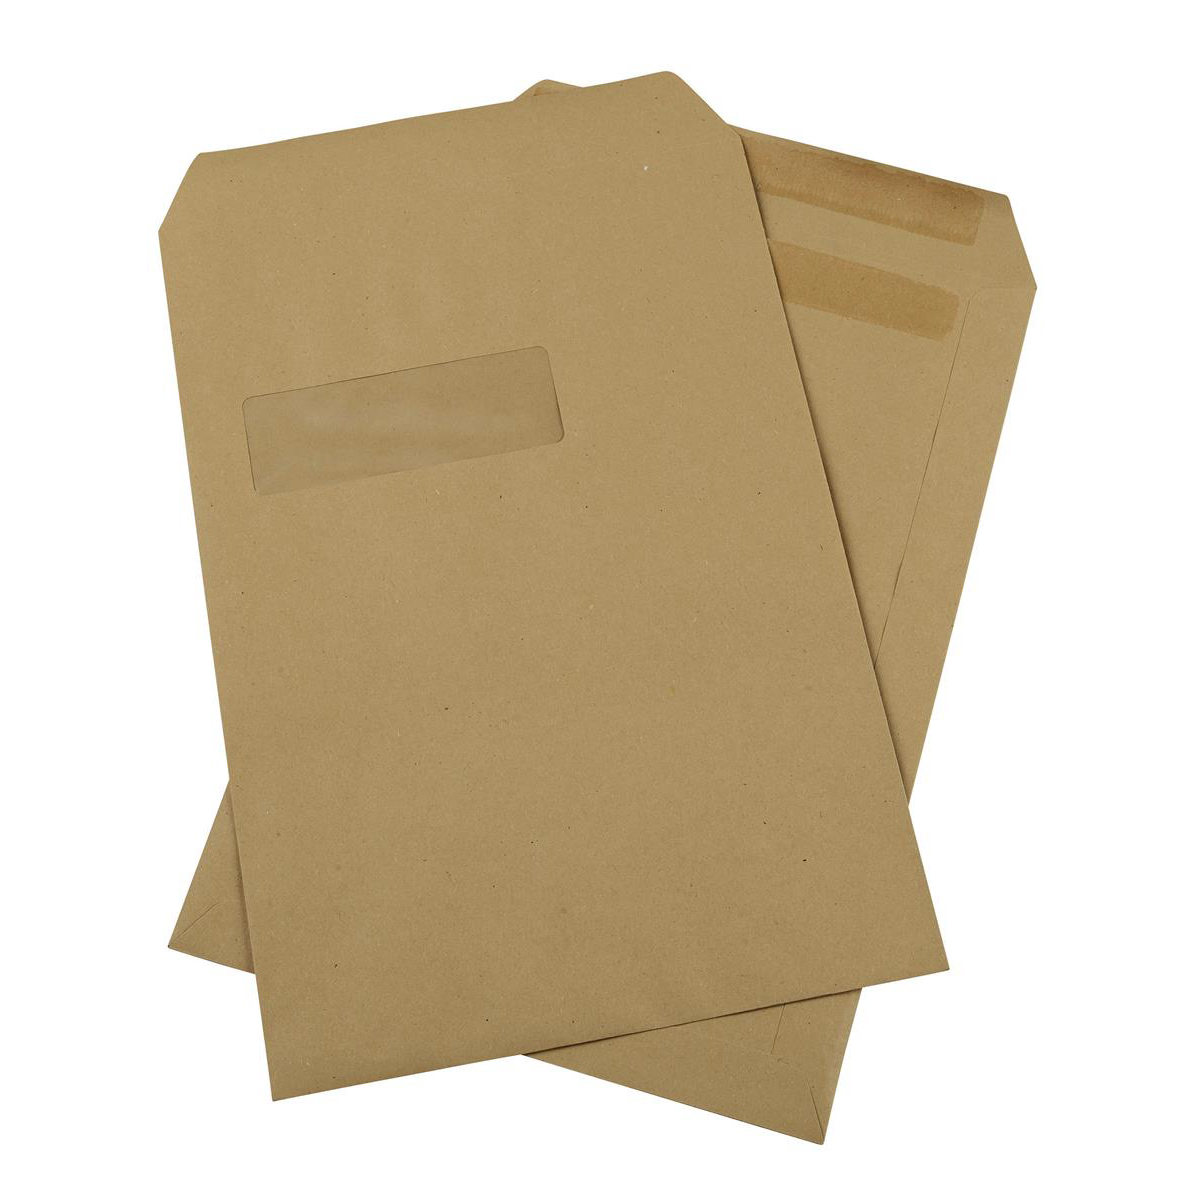 5 Star Office Envelopes PEFC Pocket Self Seal Window 90gsm C4 324x229mm Manilla Pack 250